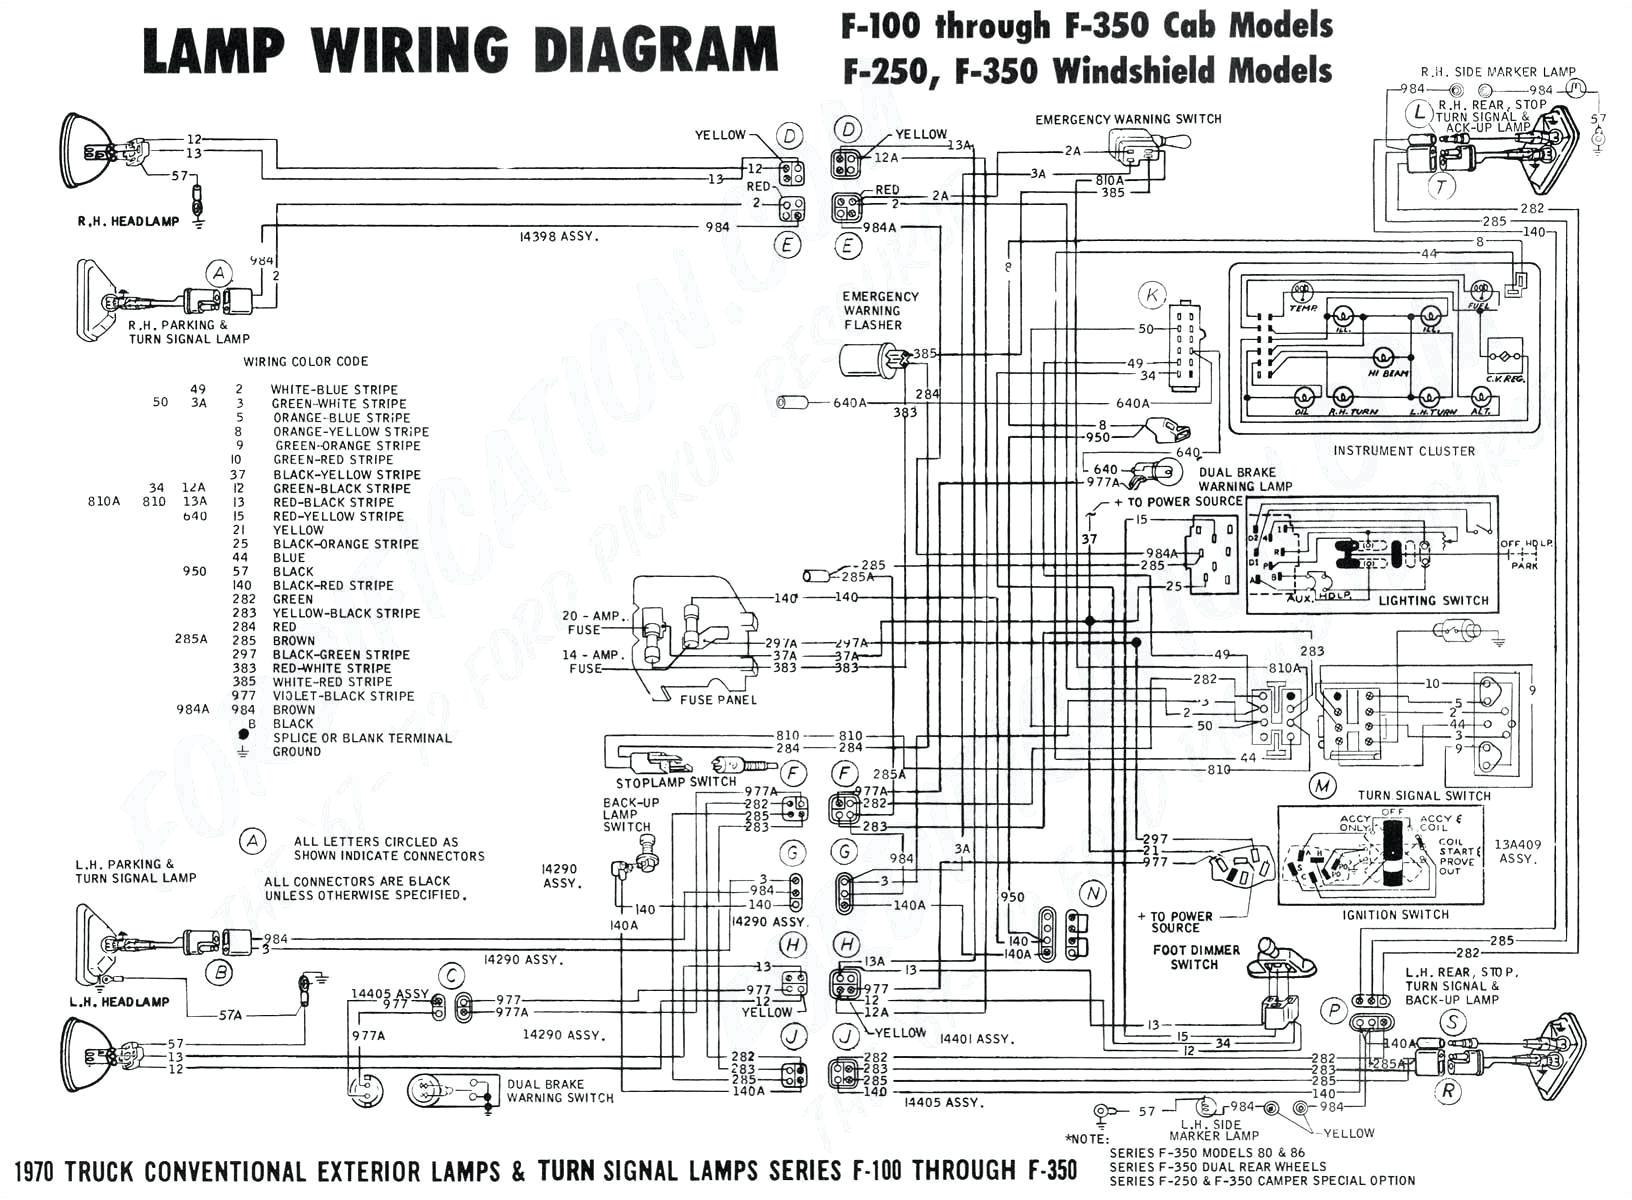 1979 vw headlight switch wiring diagram wiring diagram centre vp headlight wiring diagram